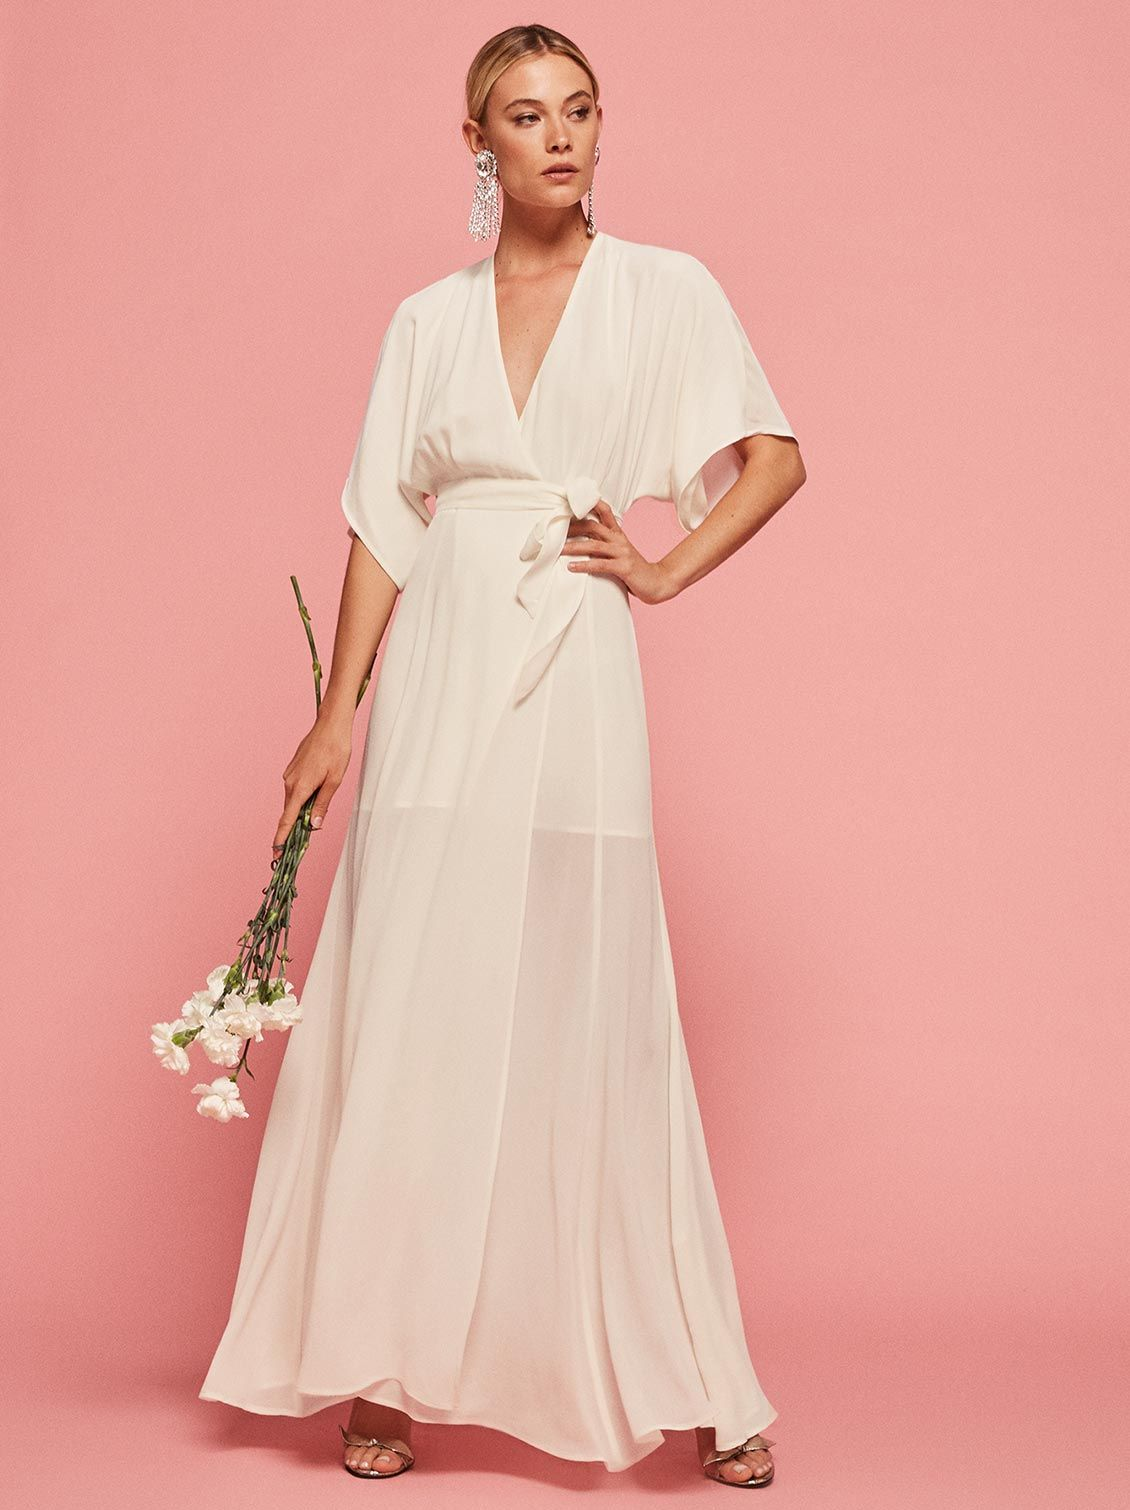 WEDDINGS - Reformation | My Wedding dress options | Pinterest ...